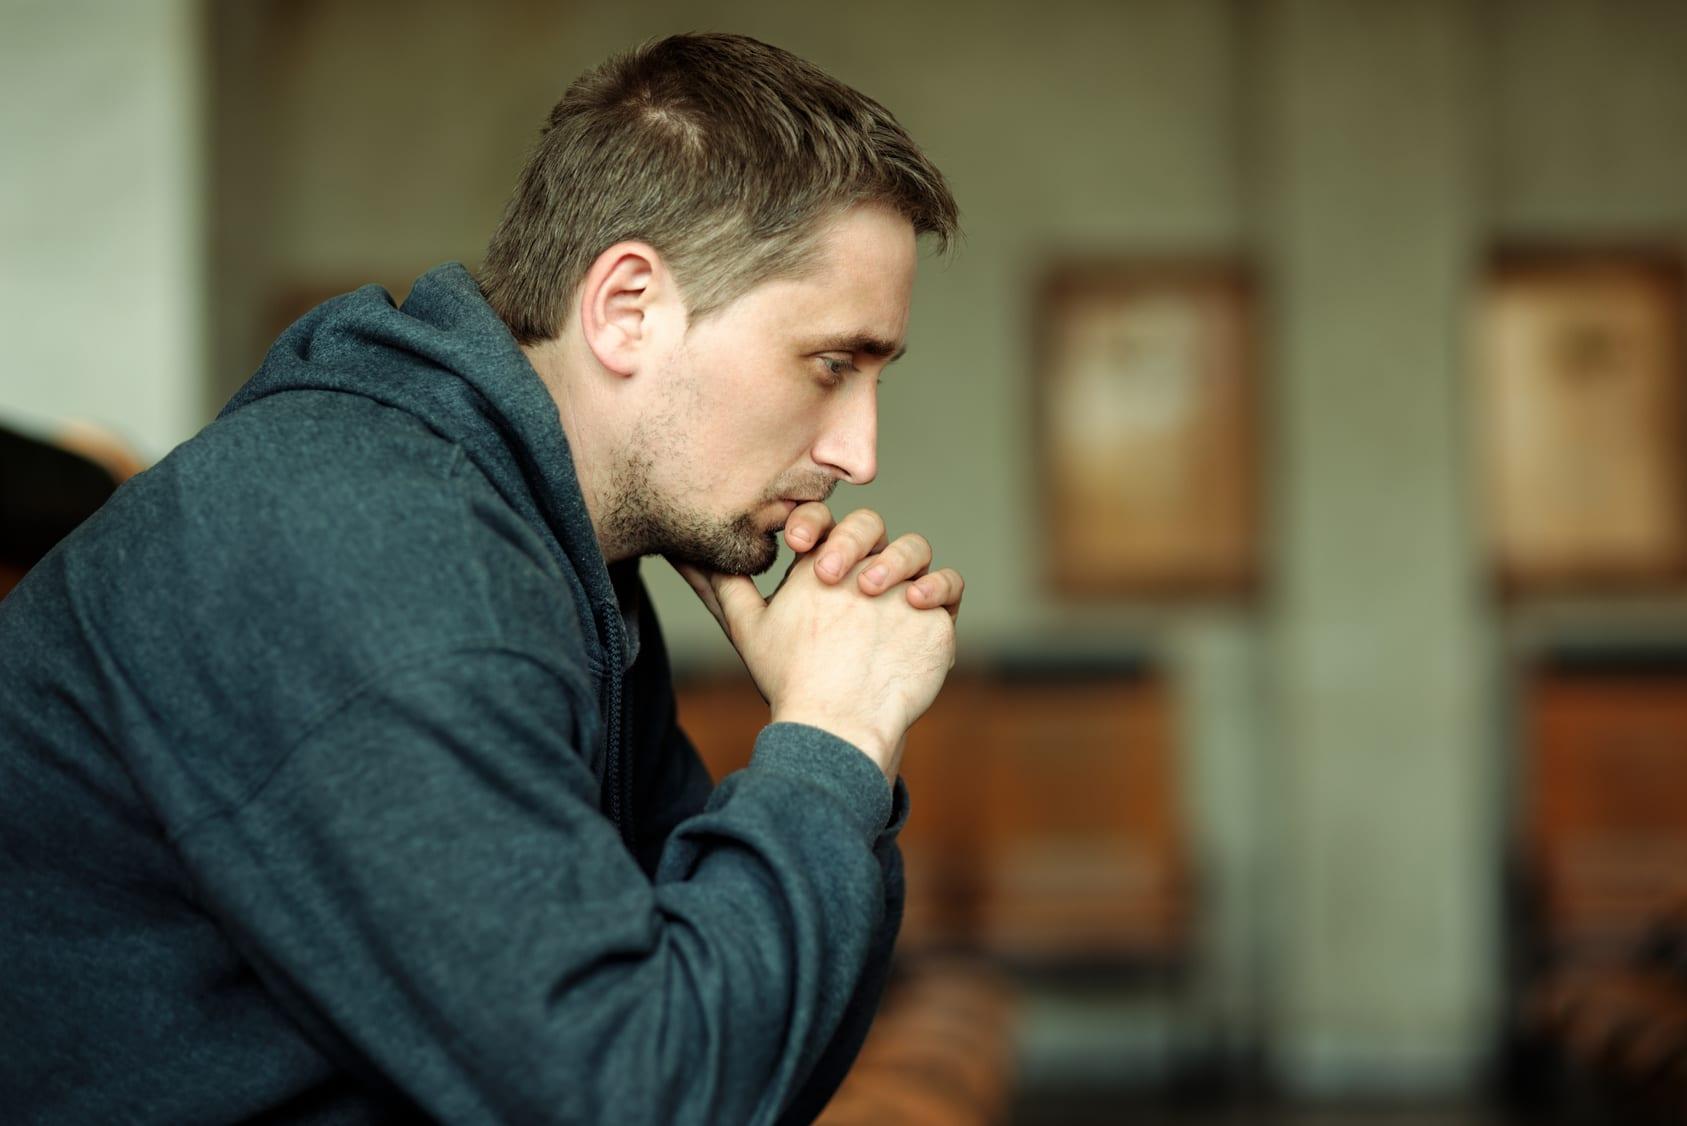 Read more about the article בדיקה גנטית חדשה מסייעת לטיפול בדיכאון